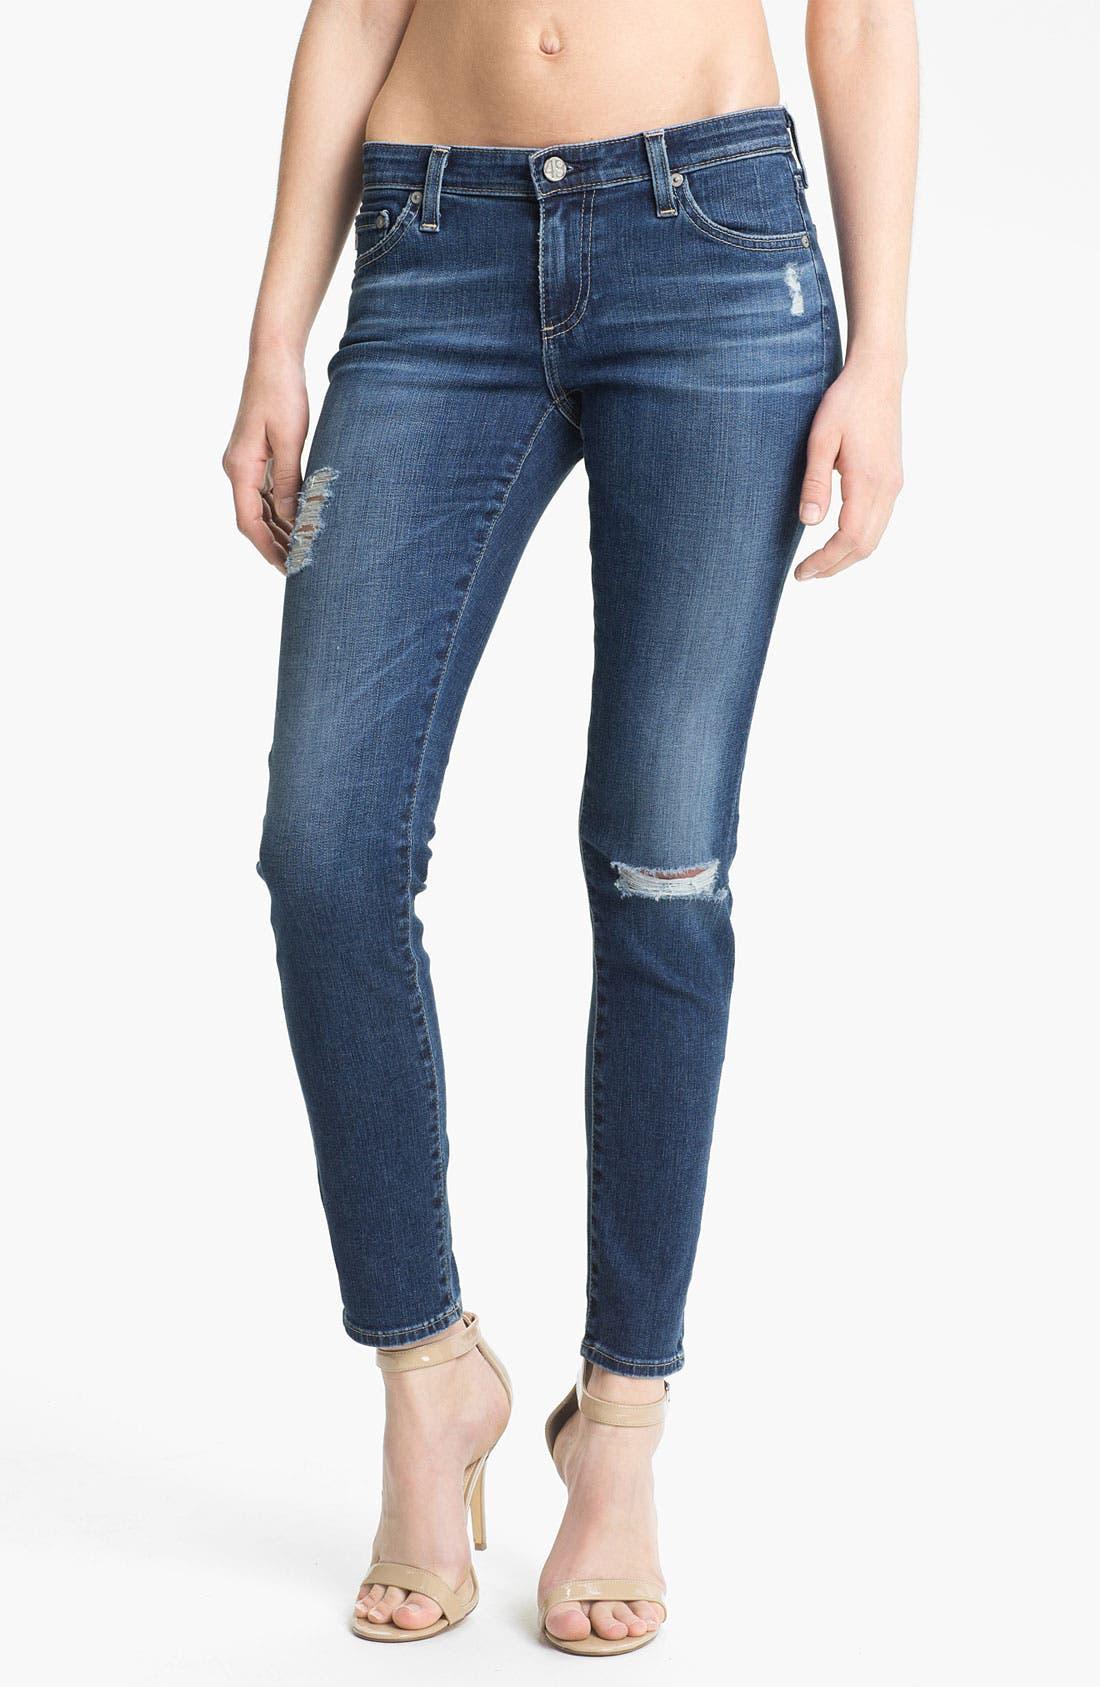 Alternate Image 1 Selected - AG The Legging Ankle Jeans